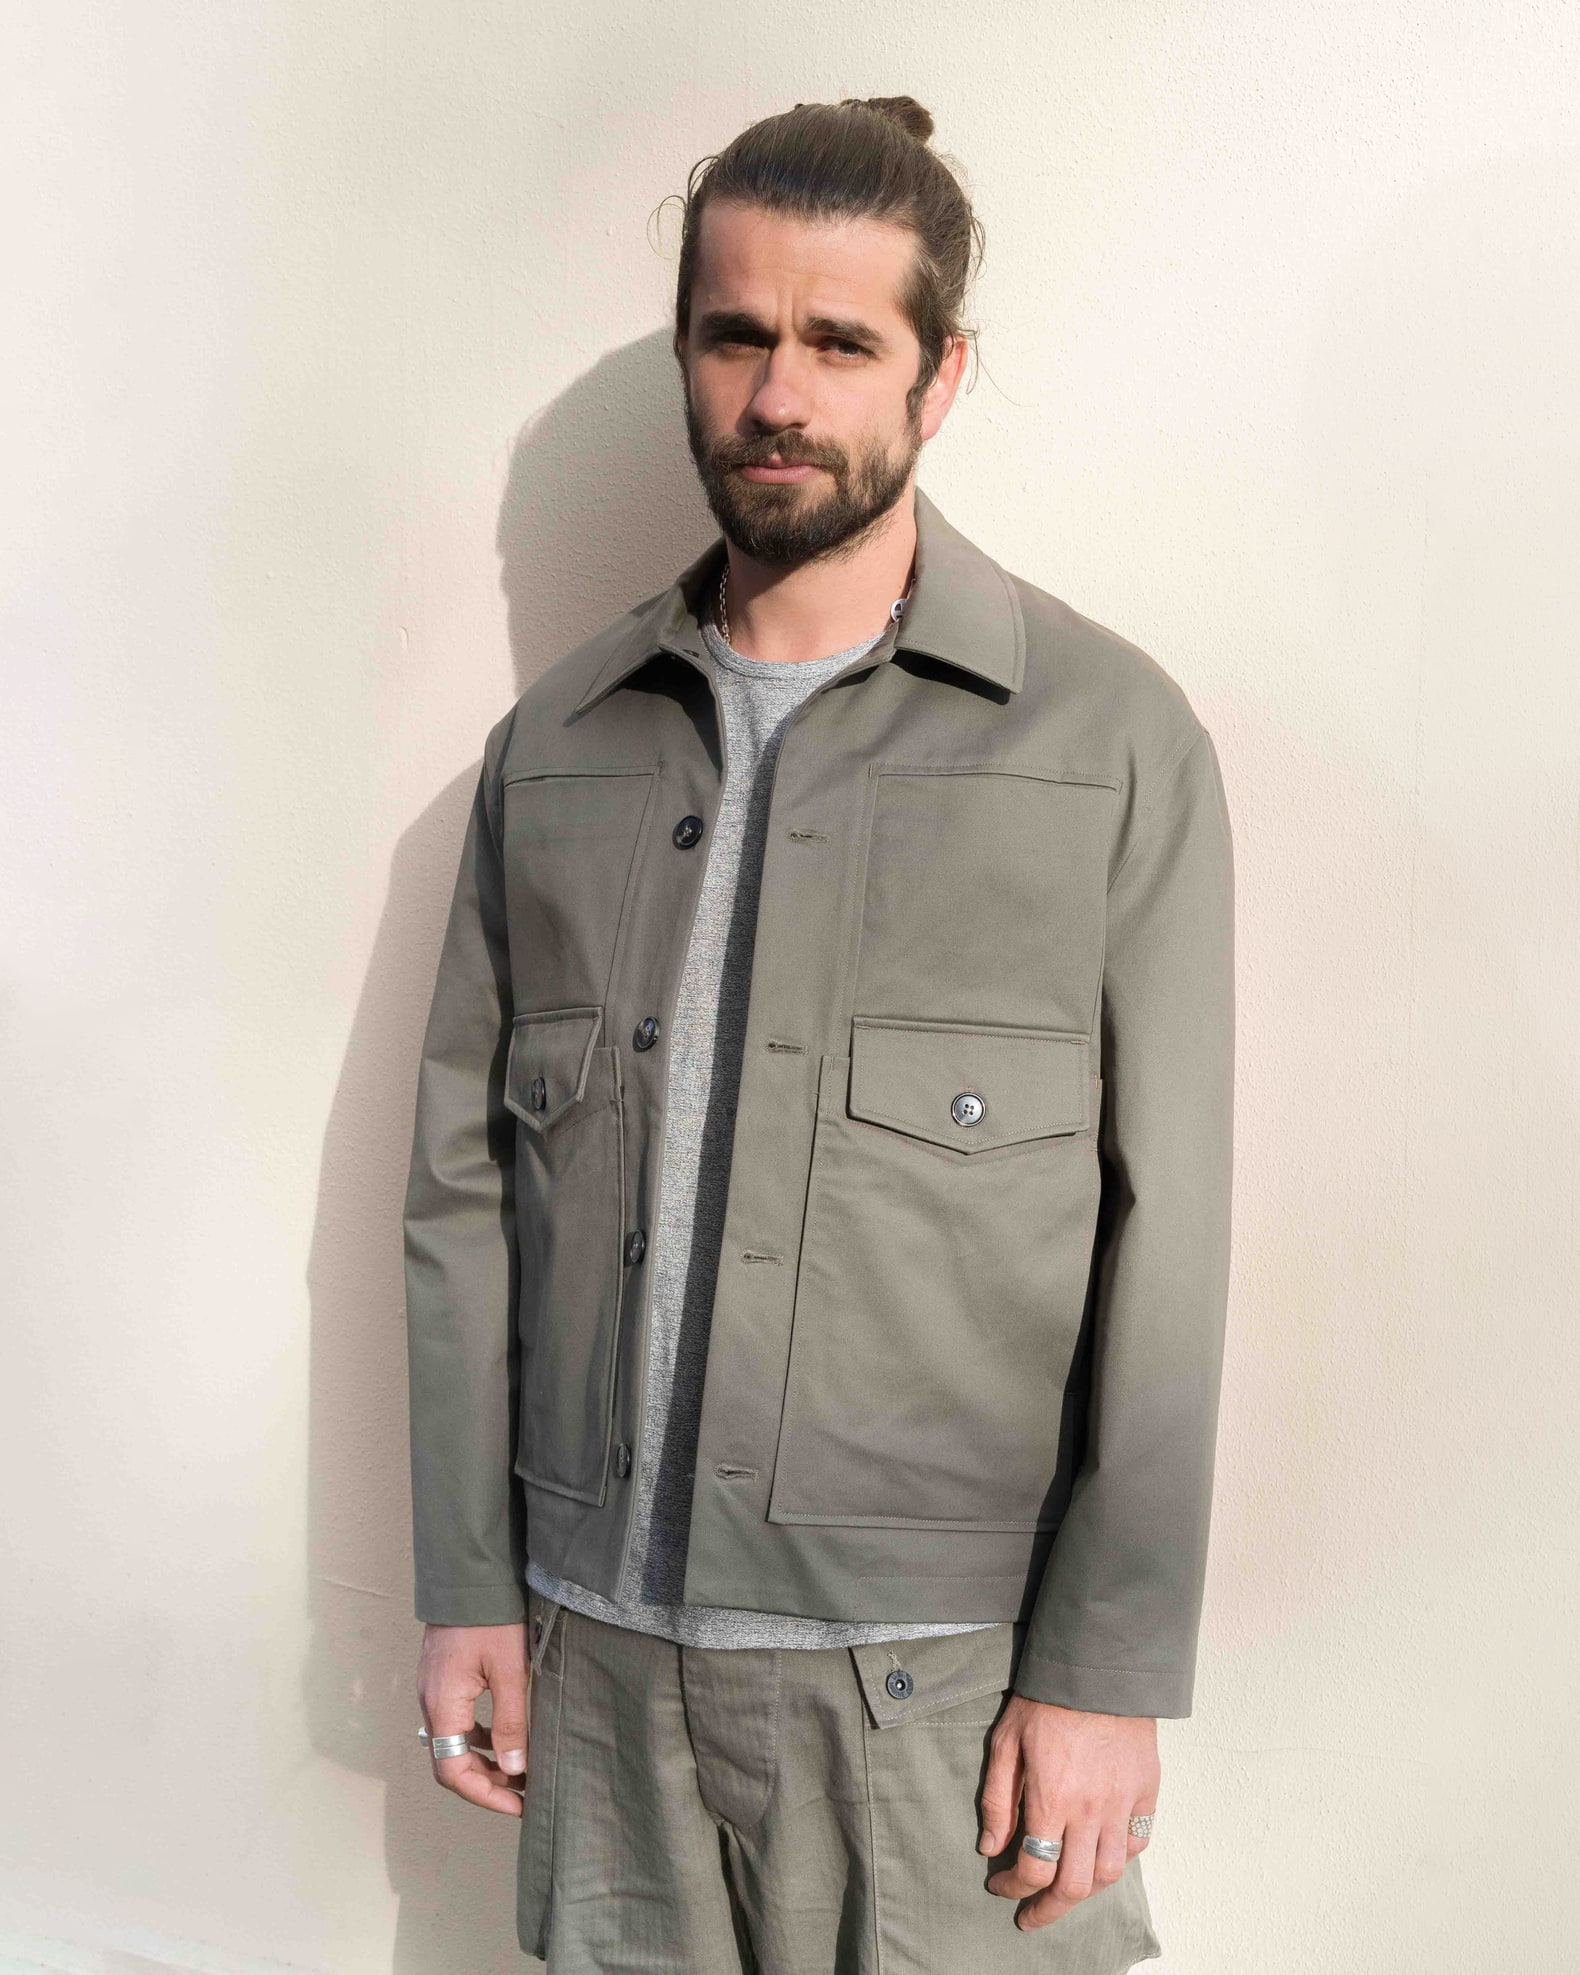 boras porte une veste verte olive de la marque coltesse